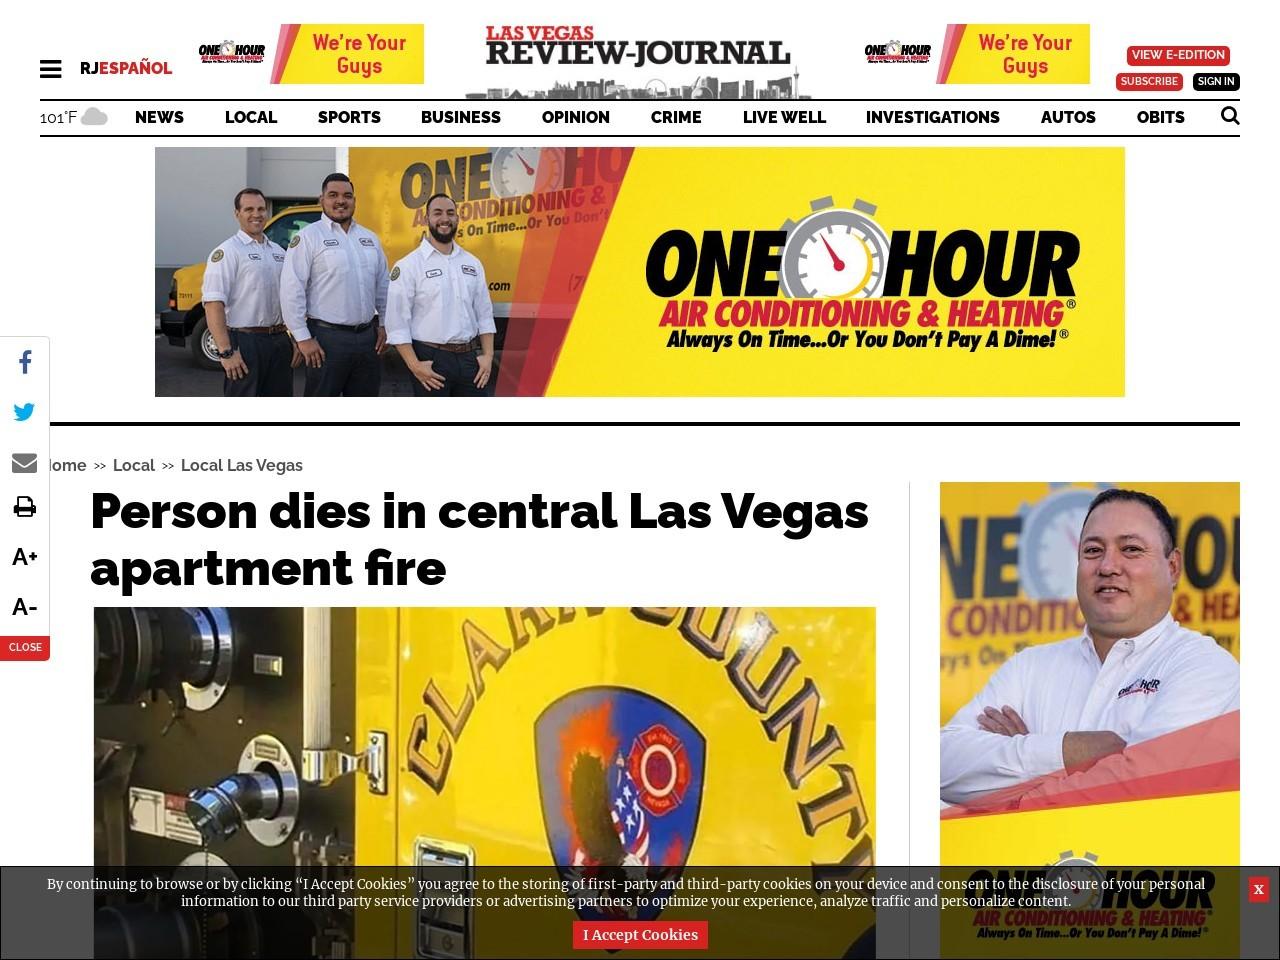 Person dies in central Las Vegas apartment fire